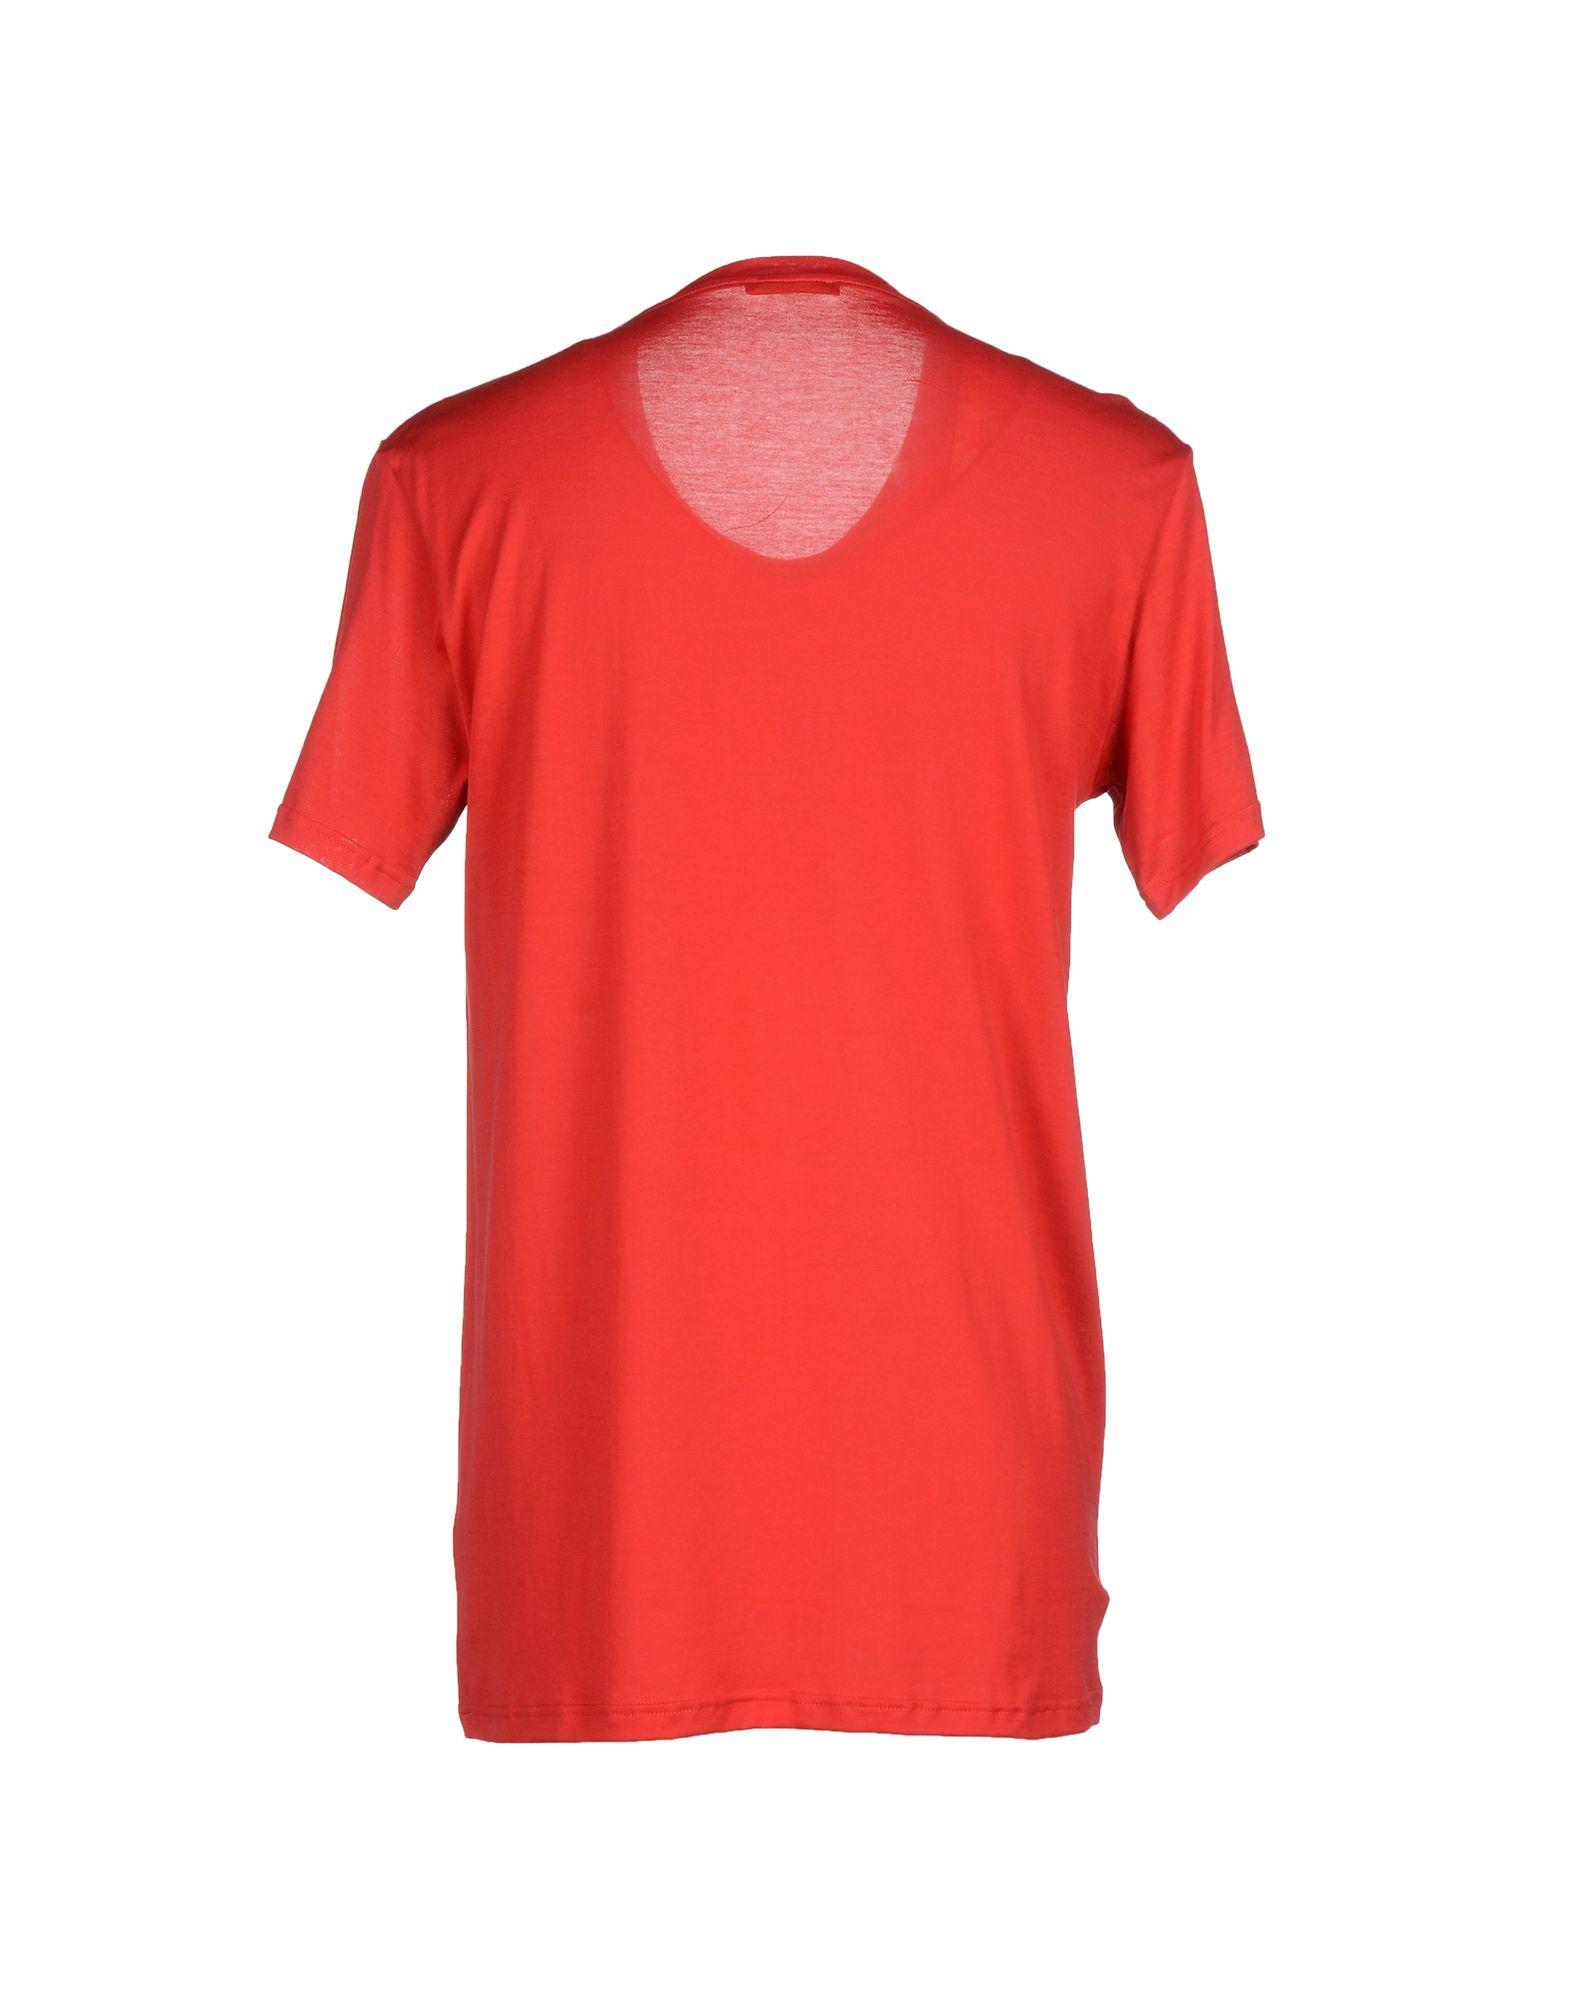 balmain t shirt in red for men lyst. Black Bedroom Furniture Sets. Home Design Ideas